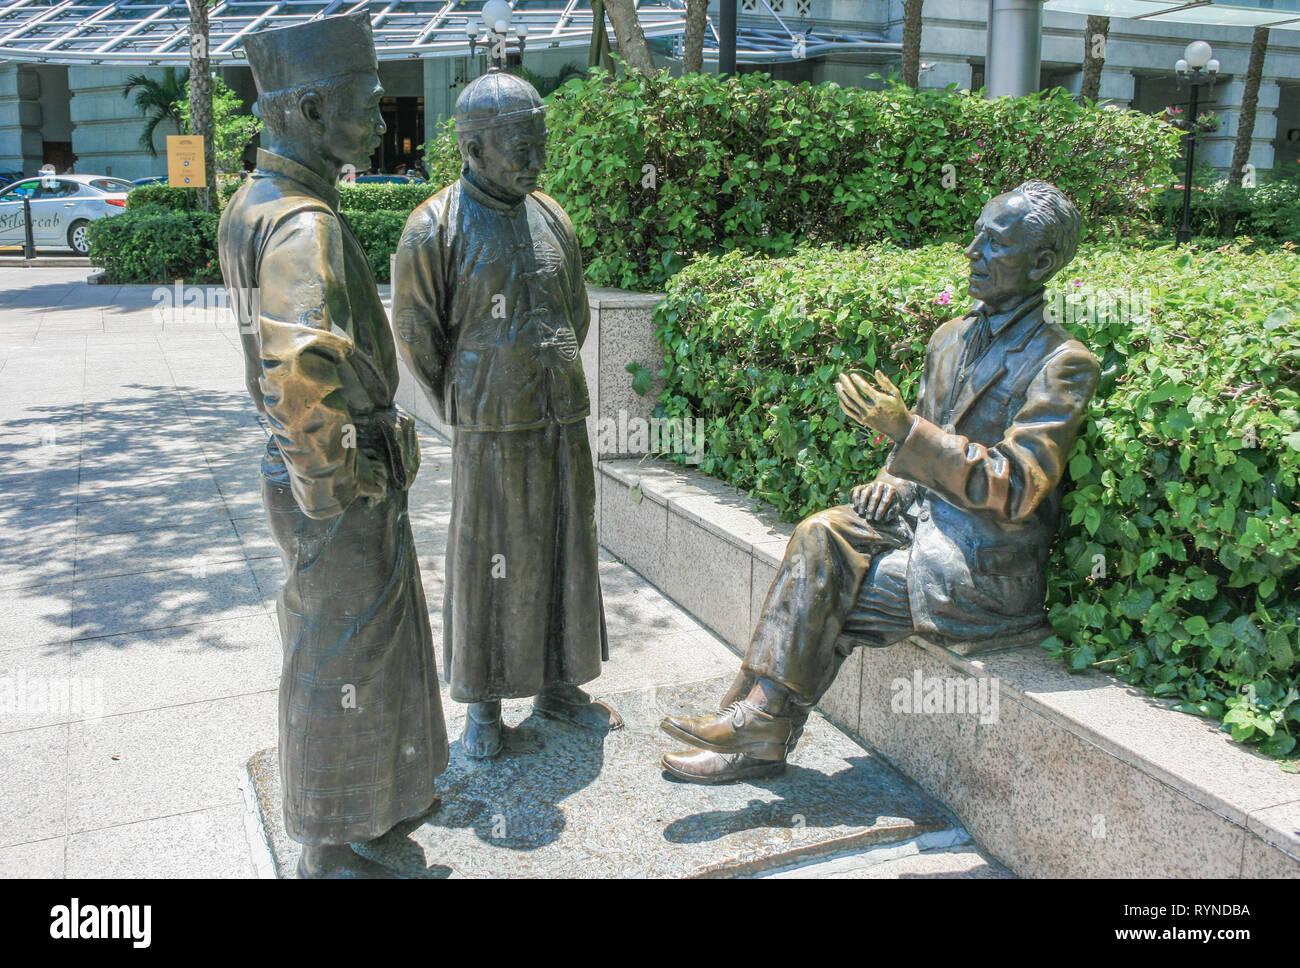 Bronze statues near Cavenagh Bridge, Singapore - Stock Image